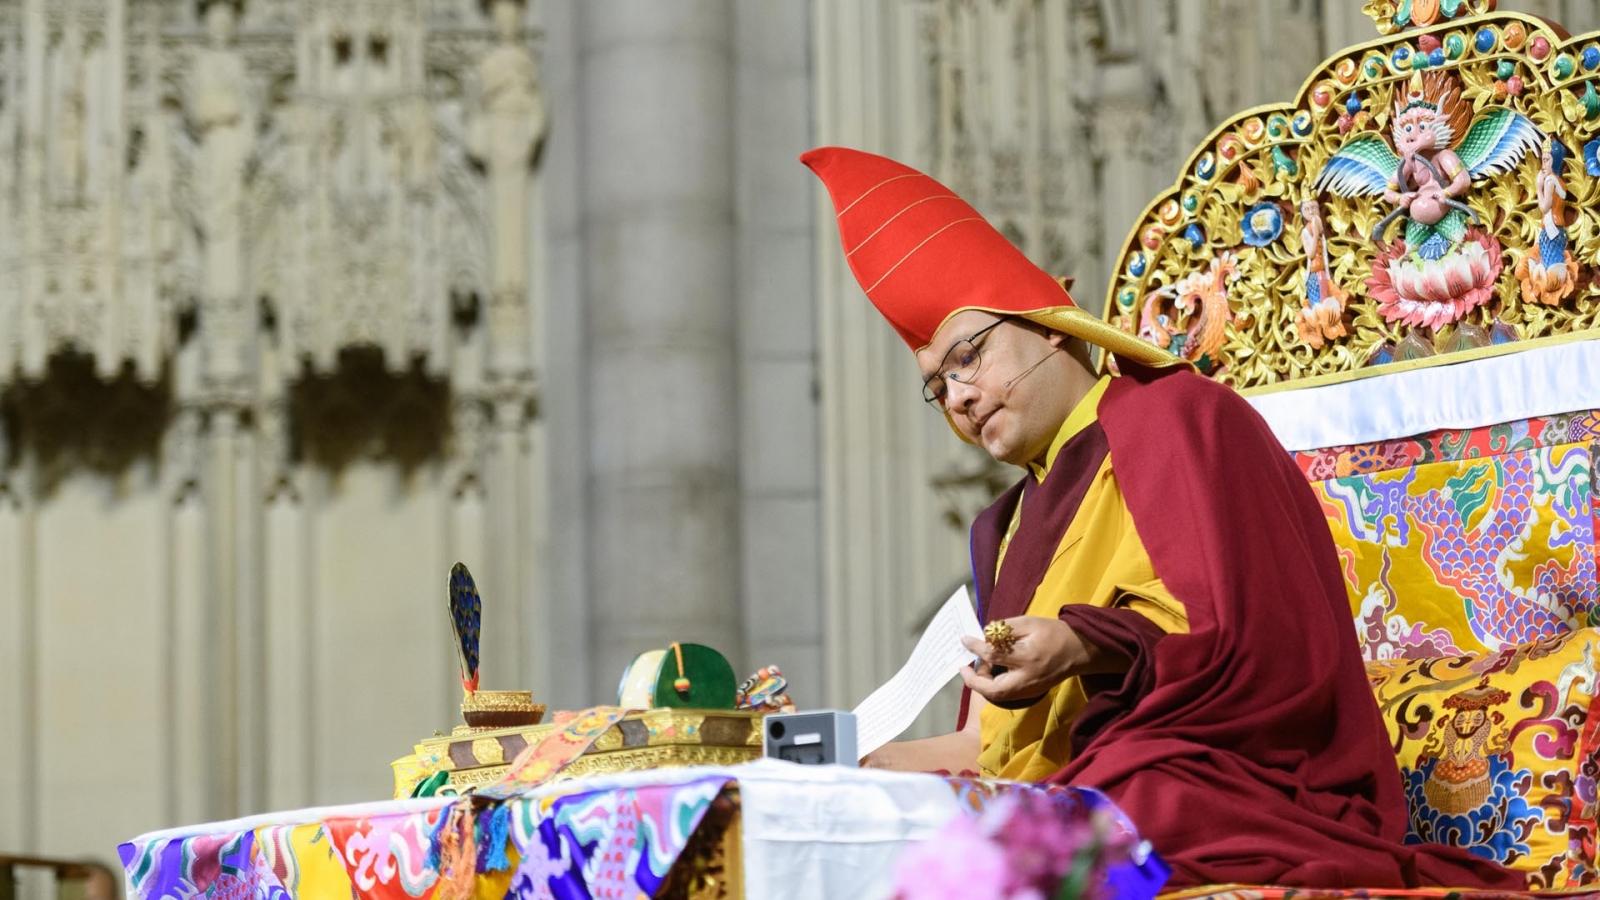 Karmapa reads text